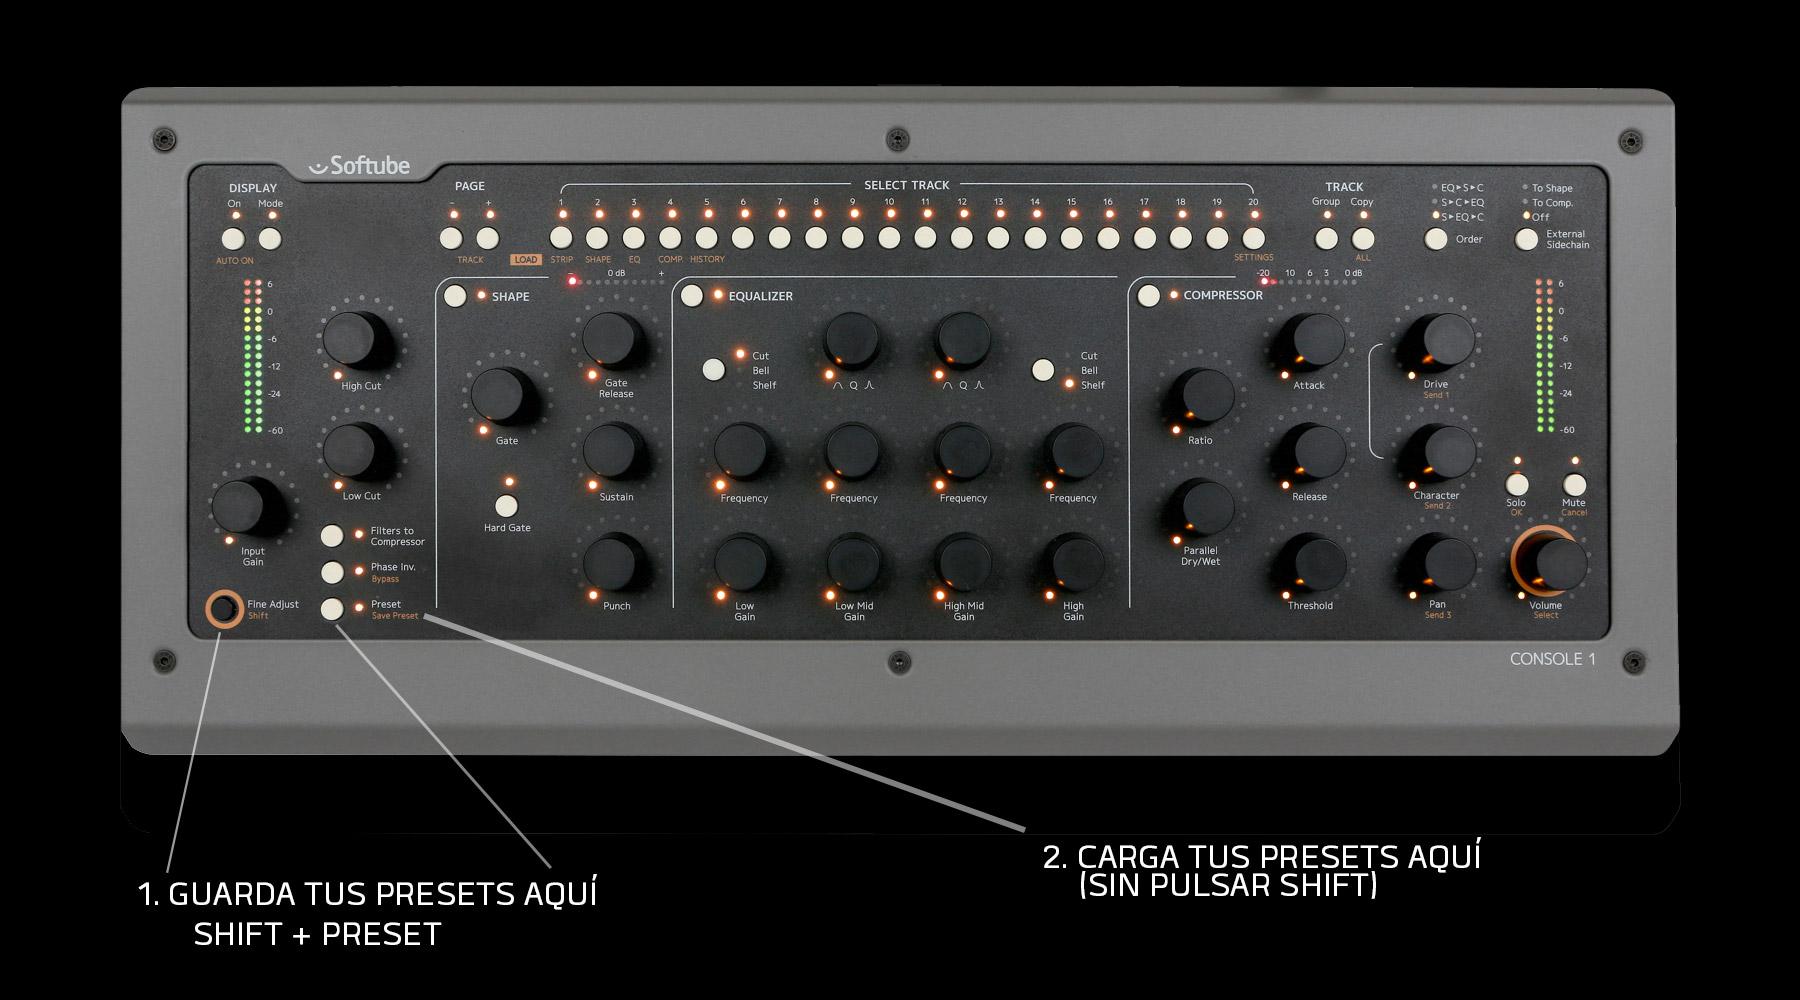 5-trucos-para-Console-1-screenshot-5